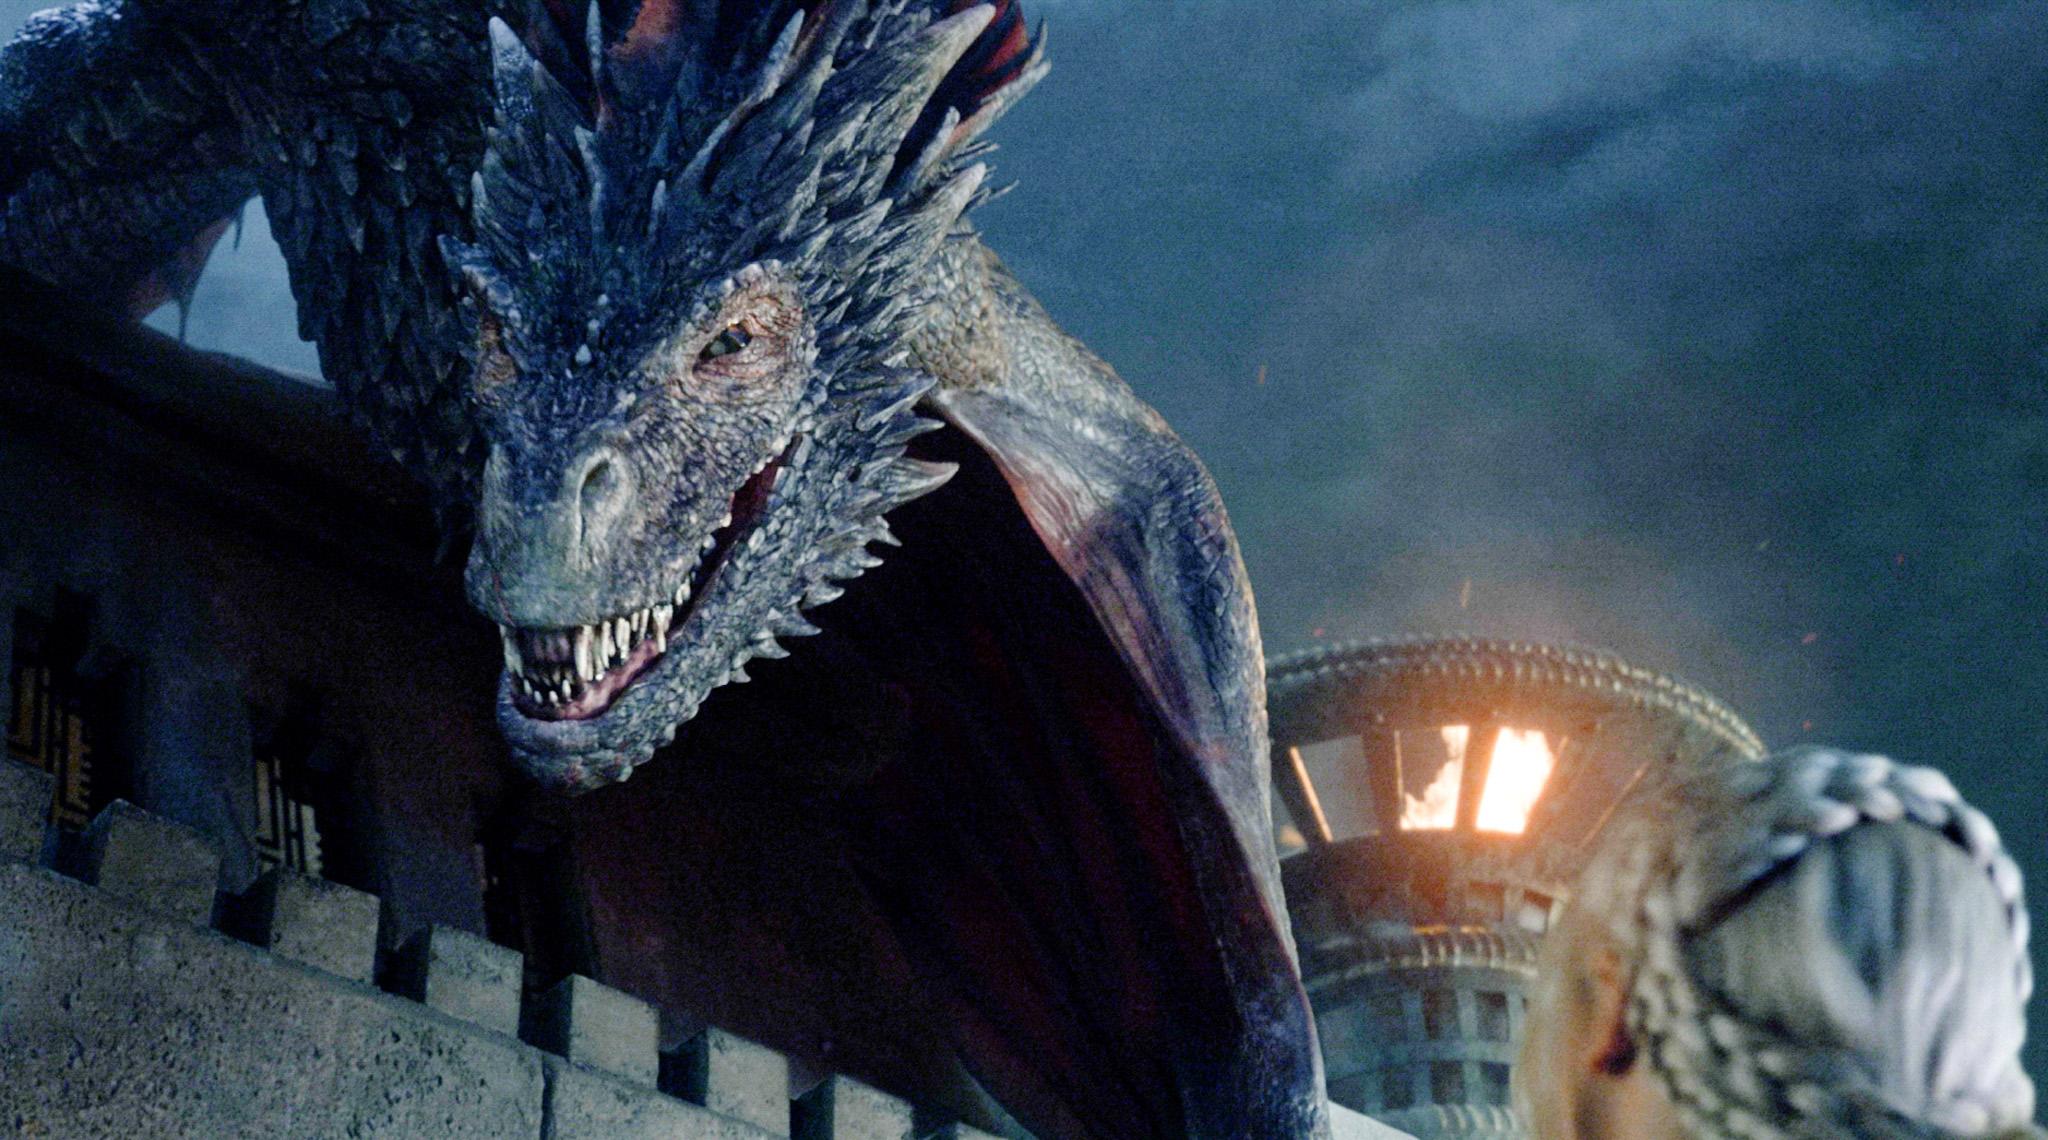 game of thrones saison 5 le making of des dragons vid o brain damaged. Black Bedroom Furniture Sets. Home Design Ideas